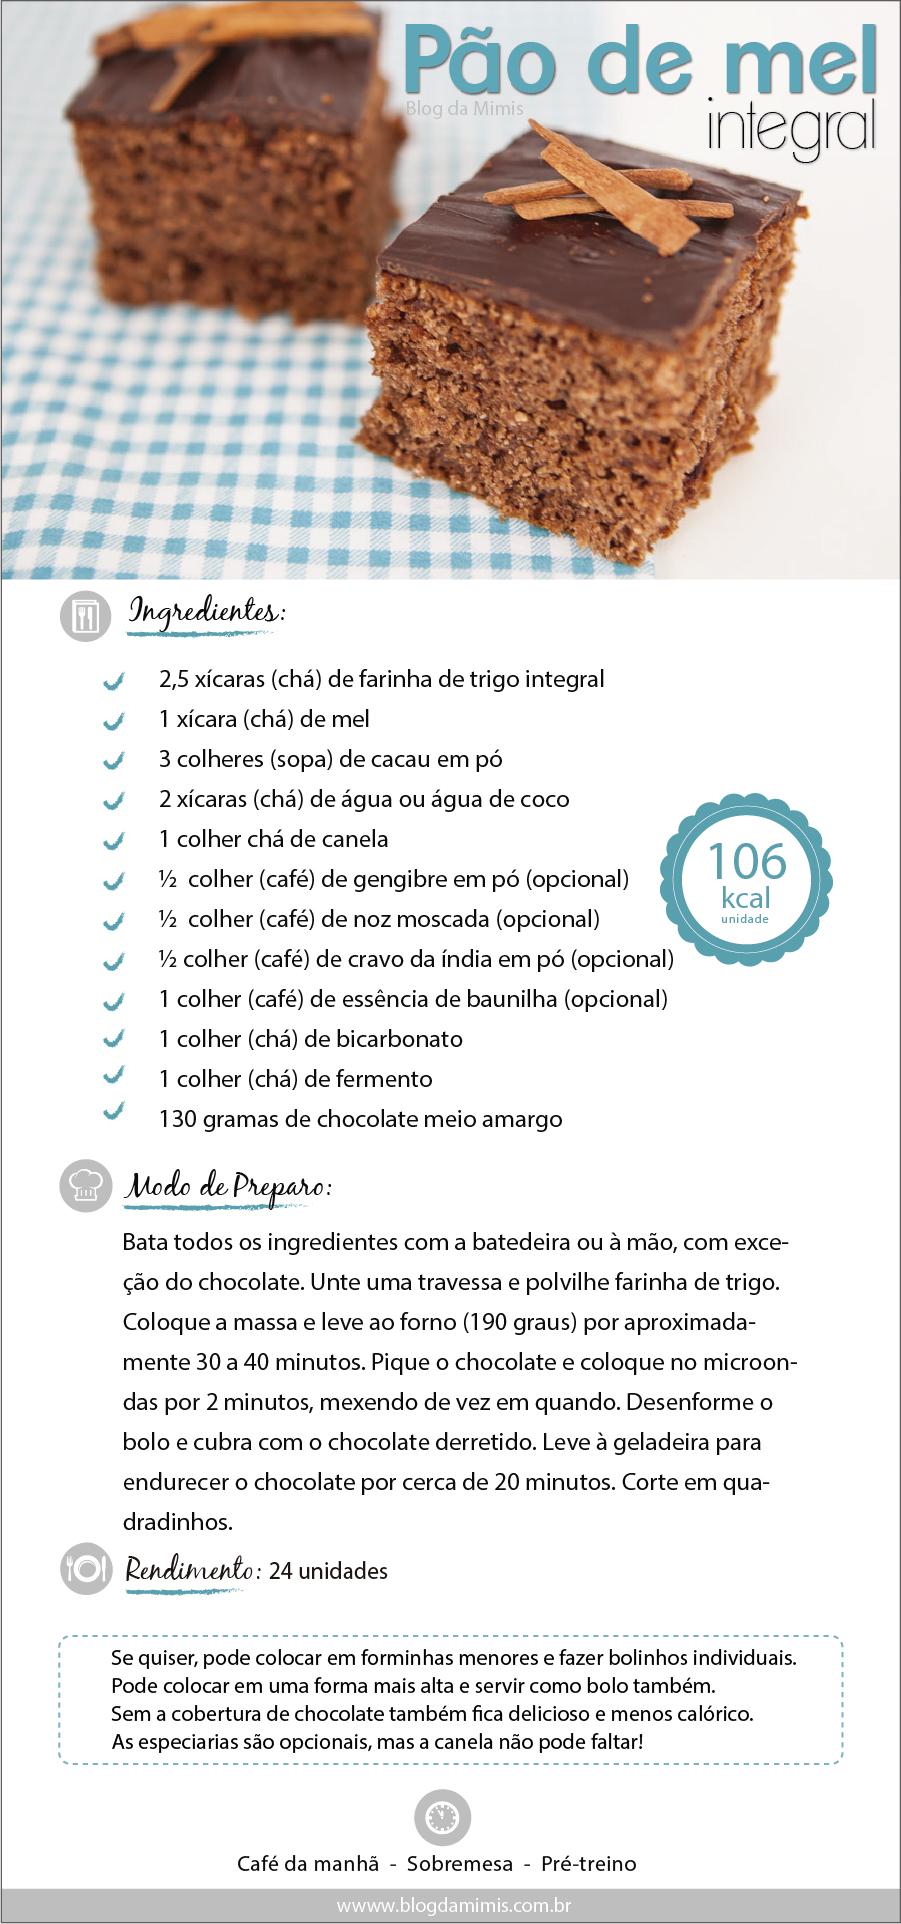 pão de mel-blog-da-mimis-michelle-franzoni-01